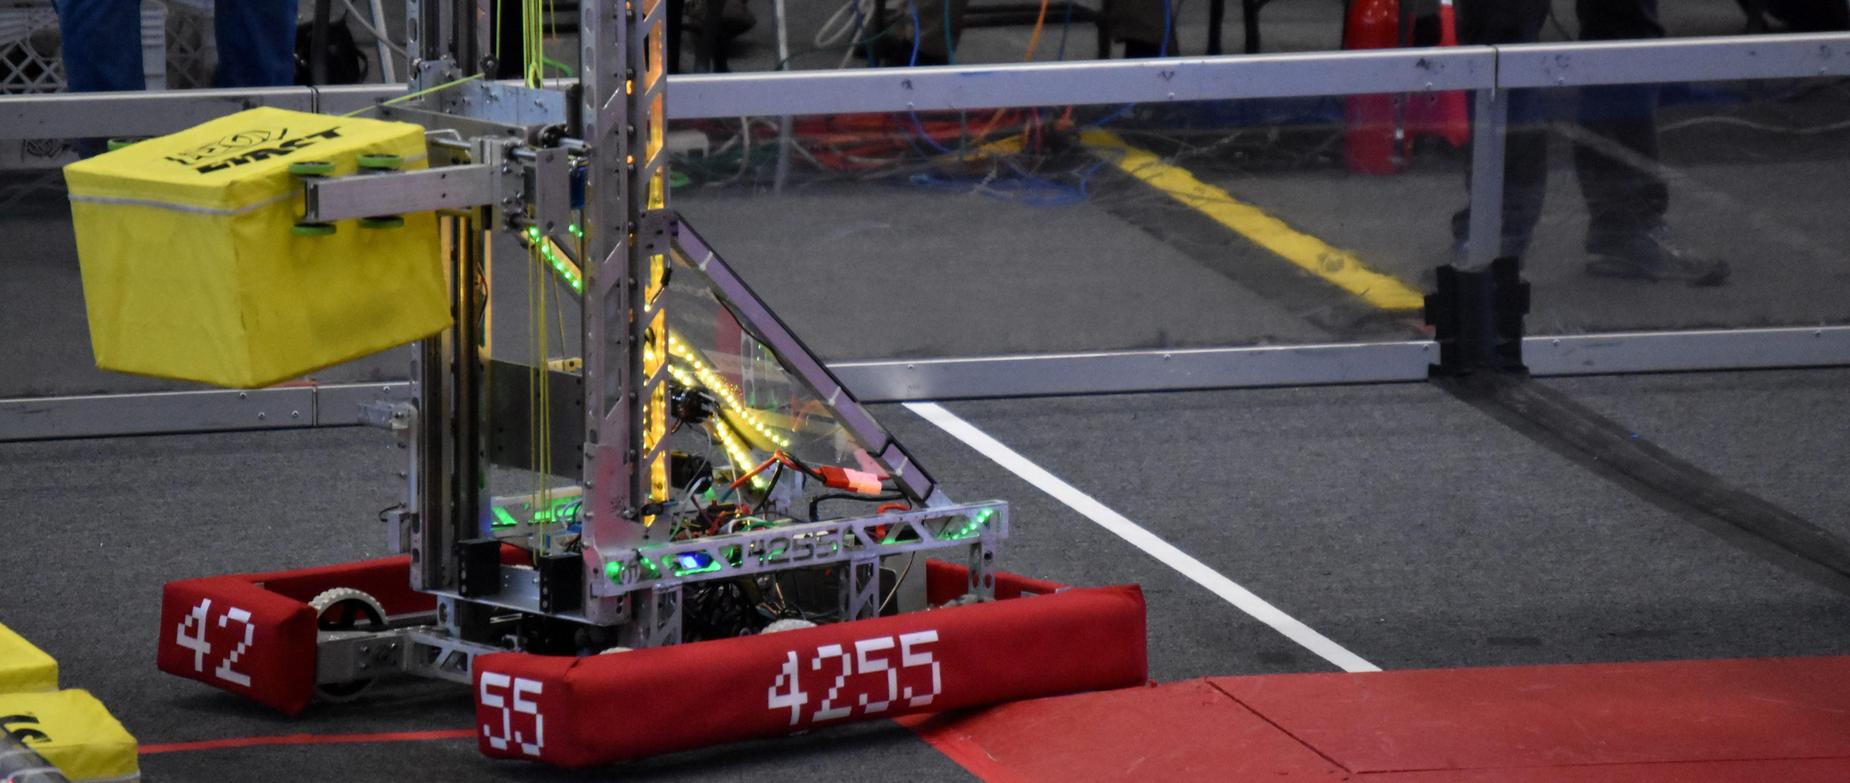 MHS Robot